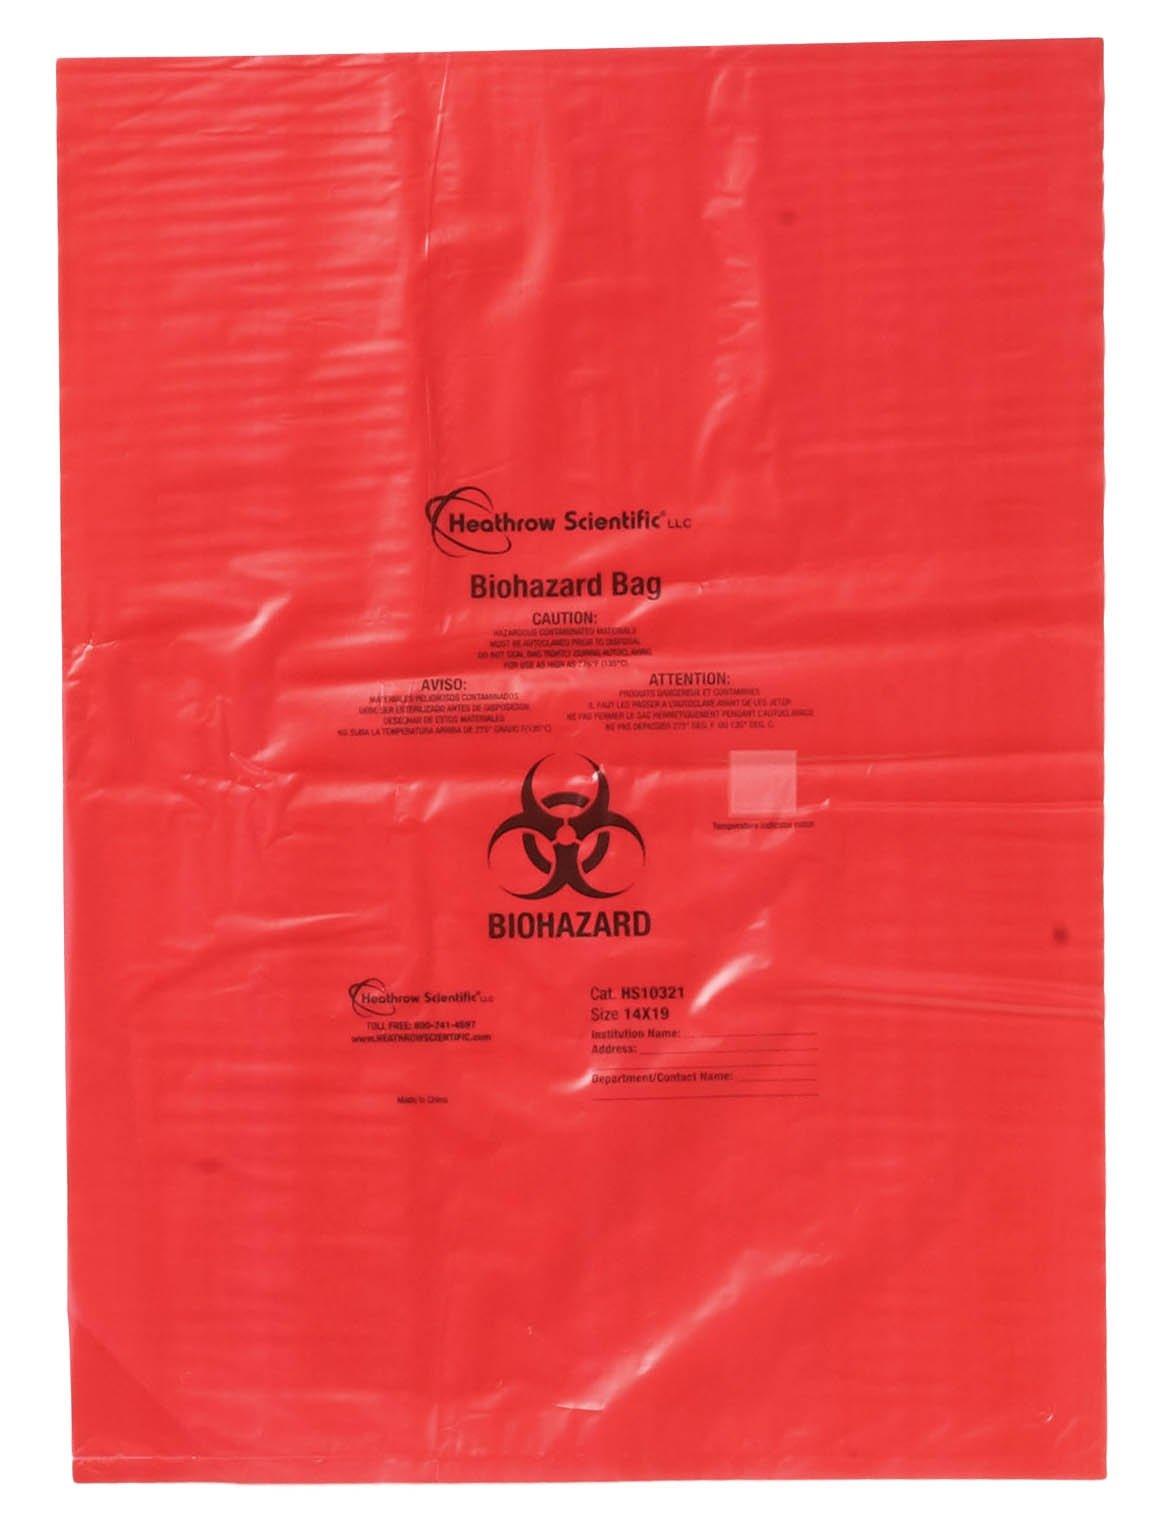 HS Biohazard Bags - 1.57mil Thick x 356mm W x 483mm L (14